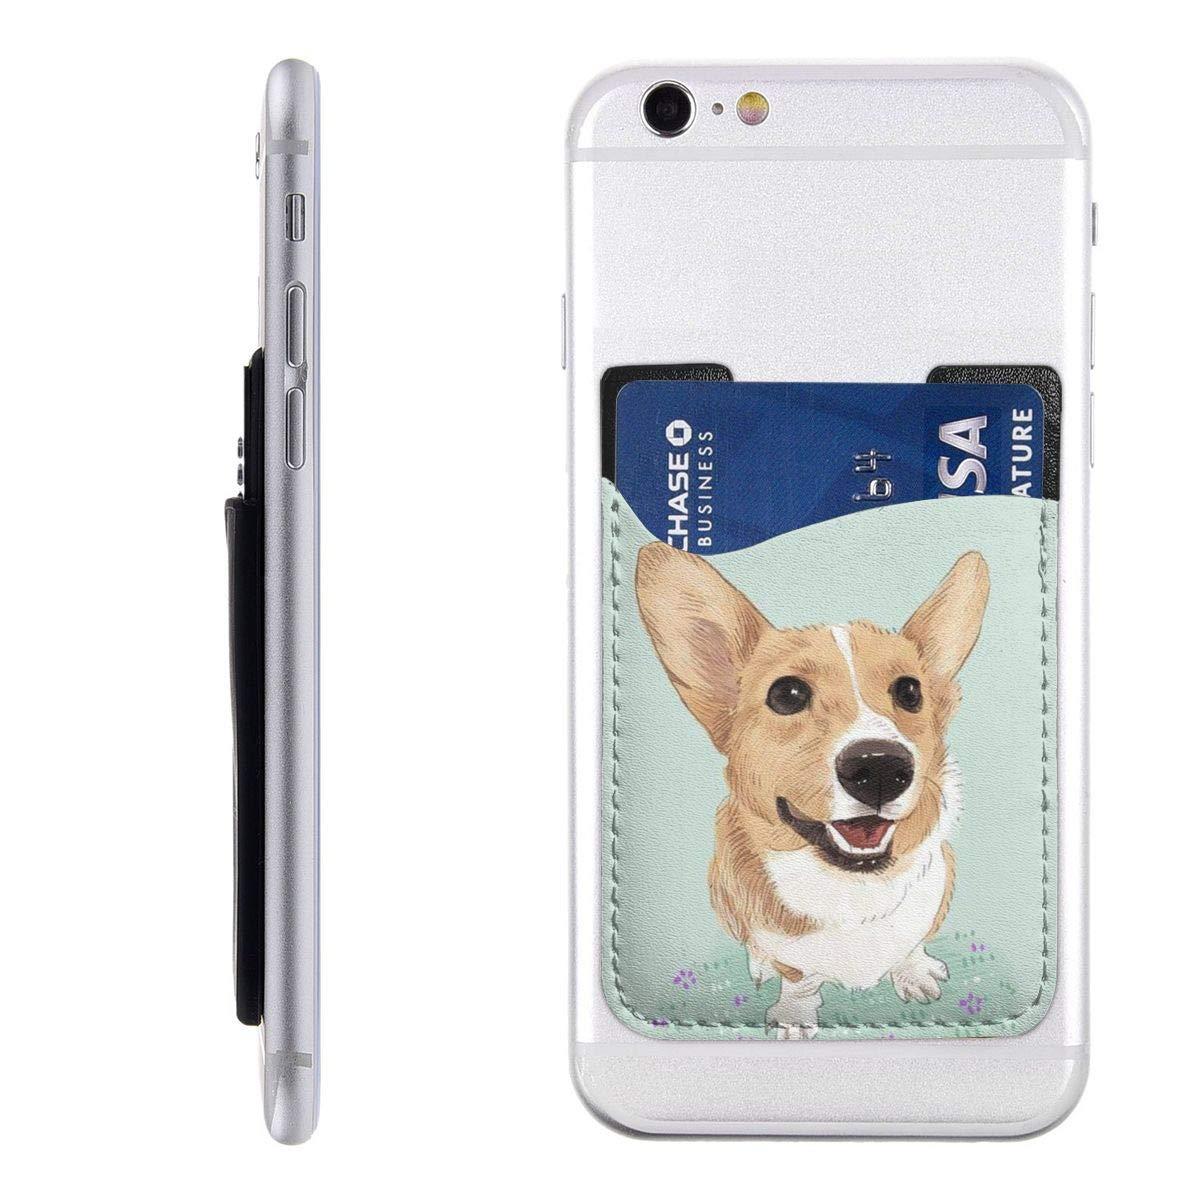 Cell Phone Card Holder >> Amazon Com Koki Dog Big Ears Cell Phone Card Holder Stick